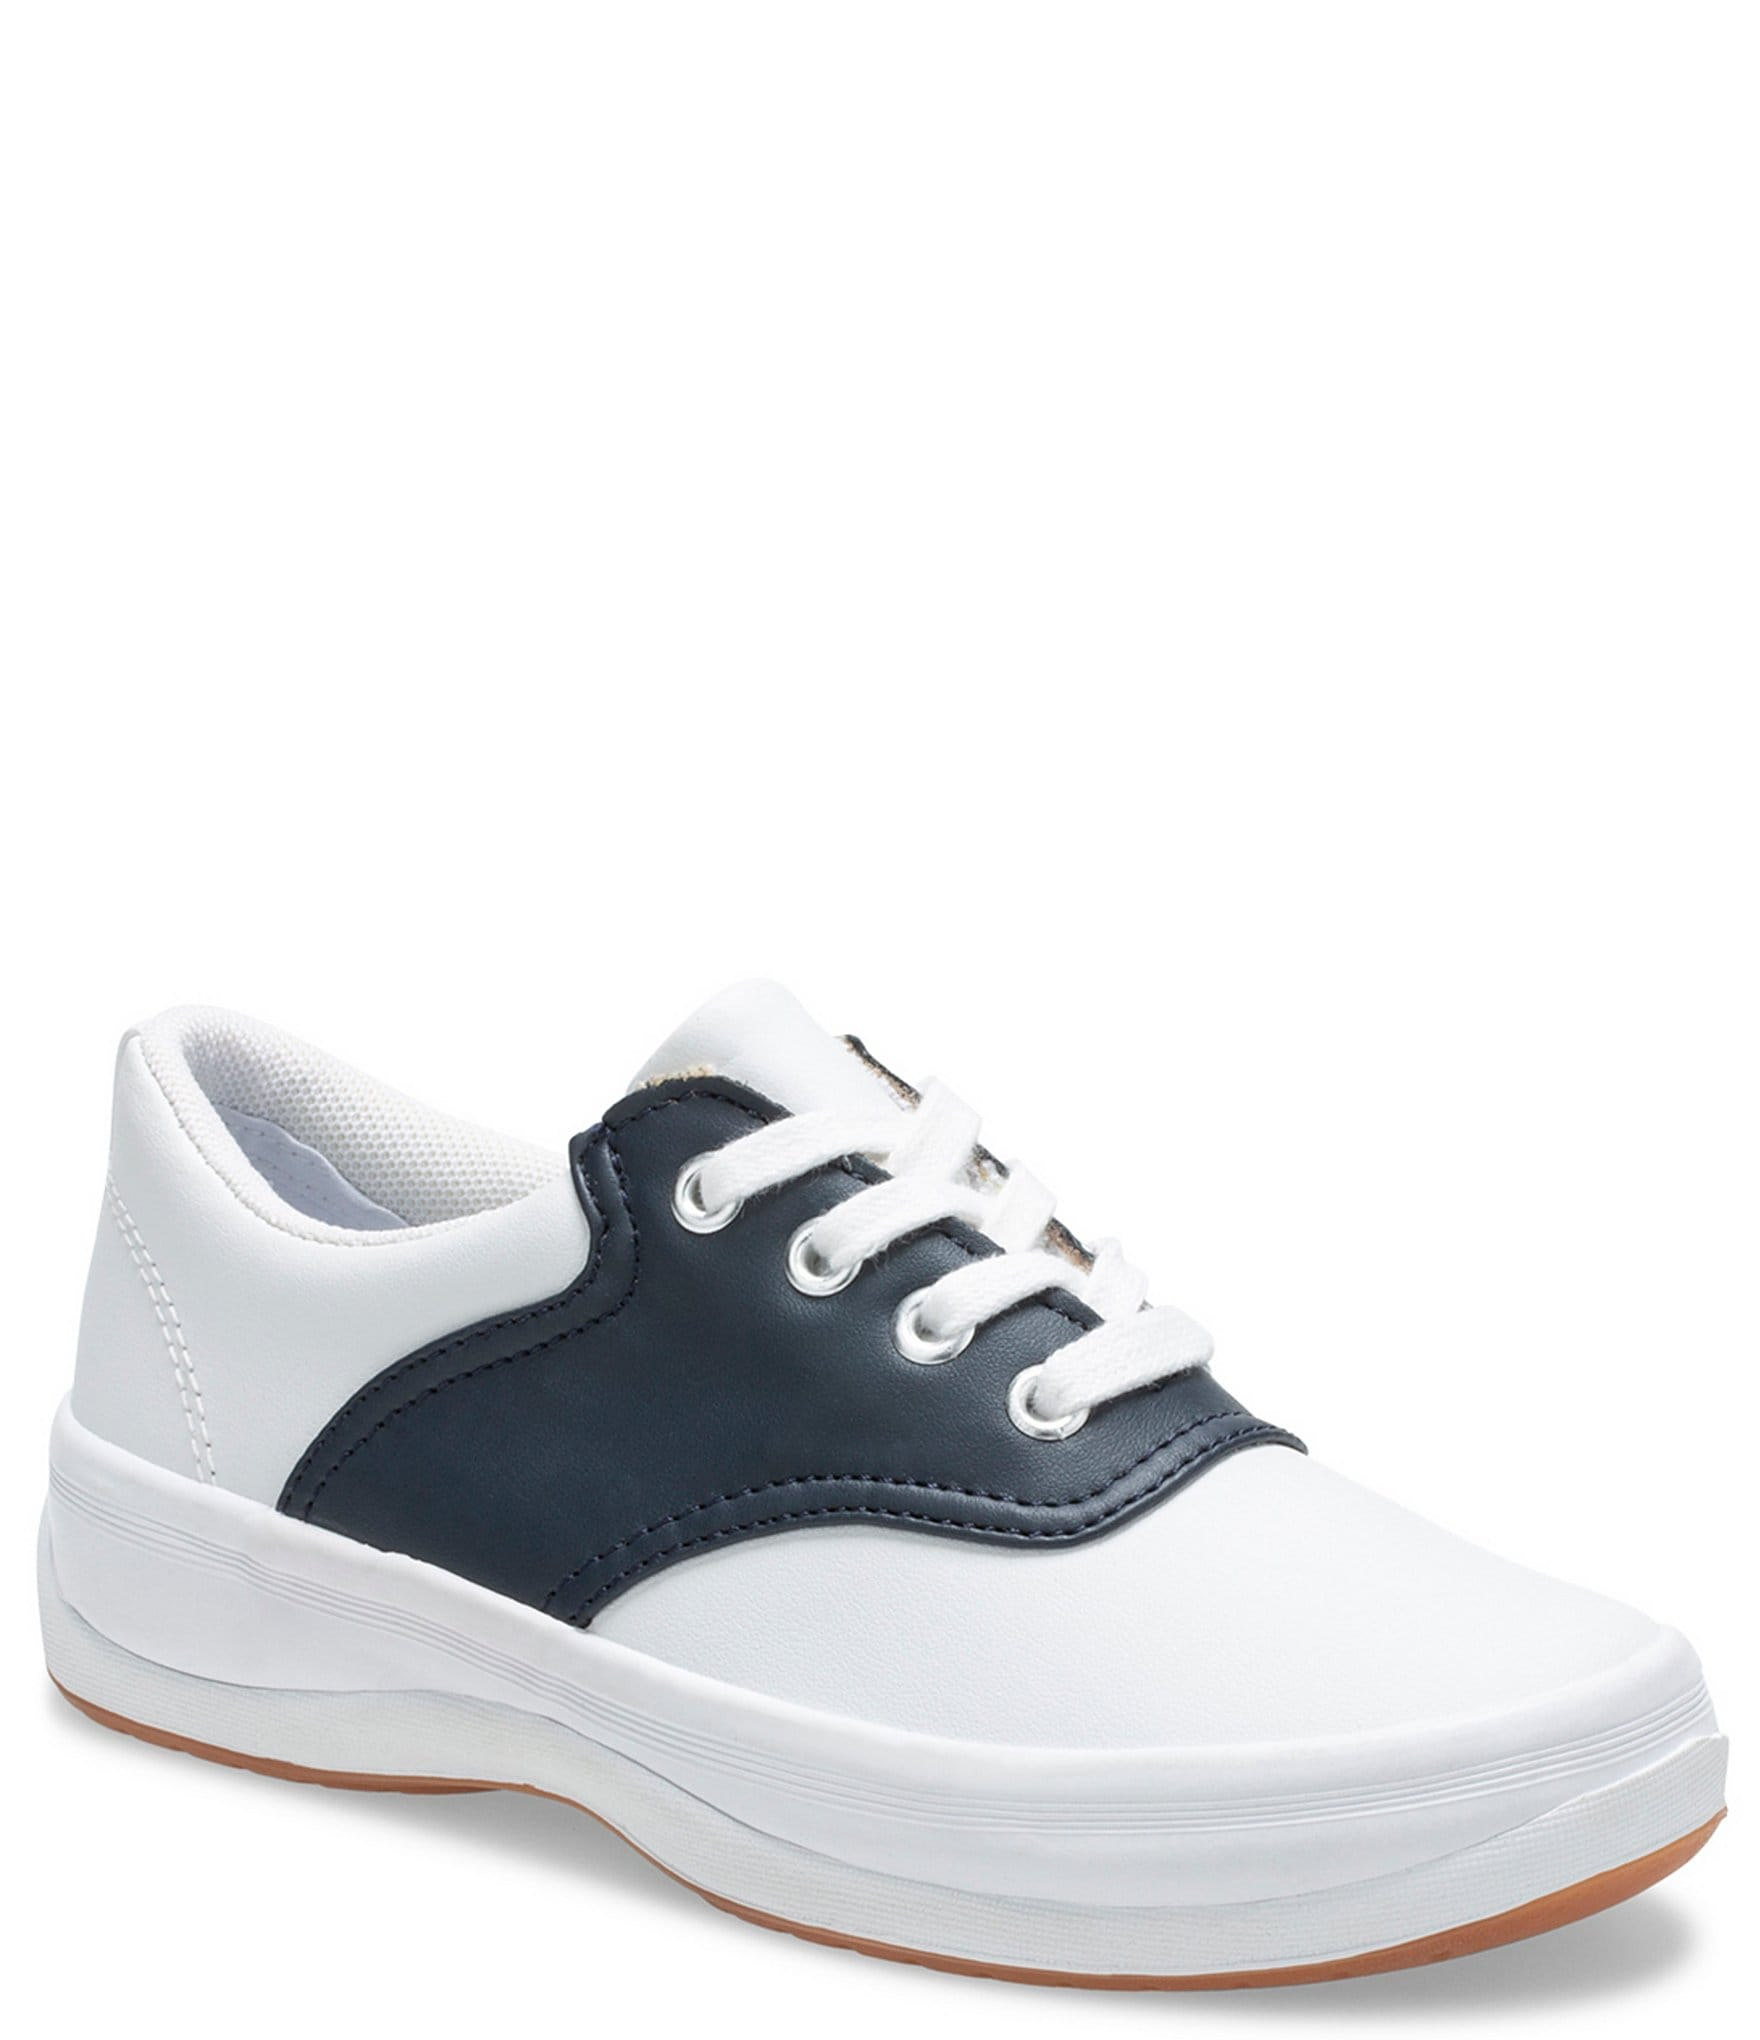 Keds Girls' School Days II Sneakers